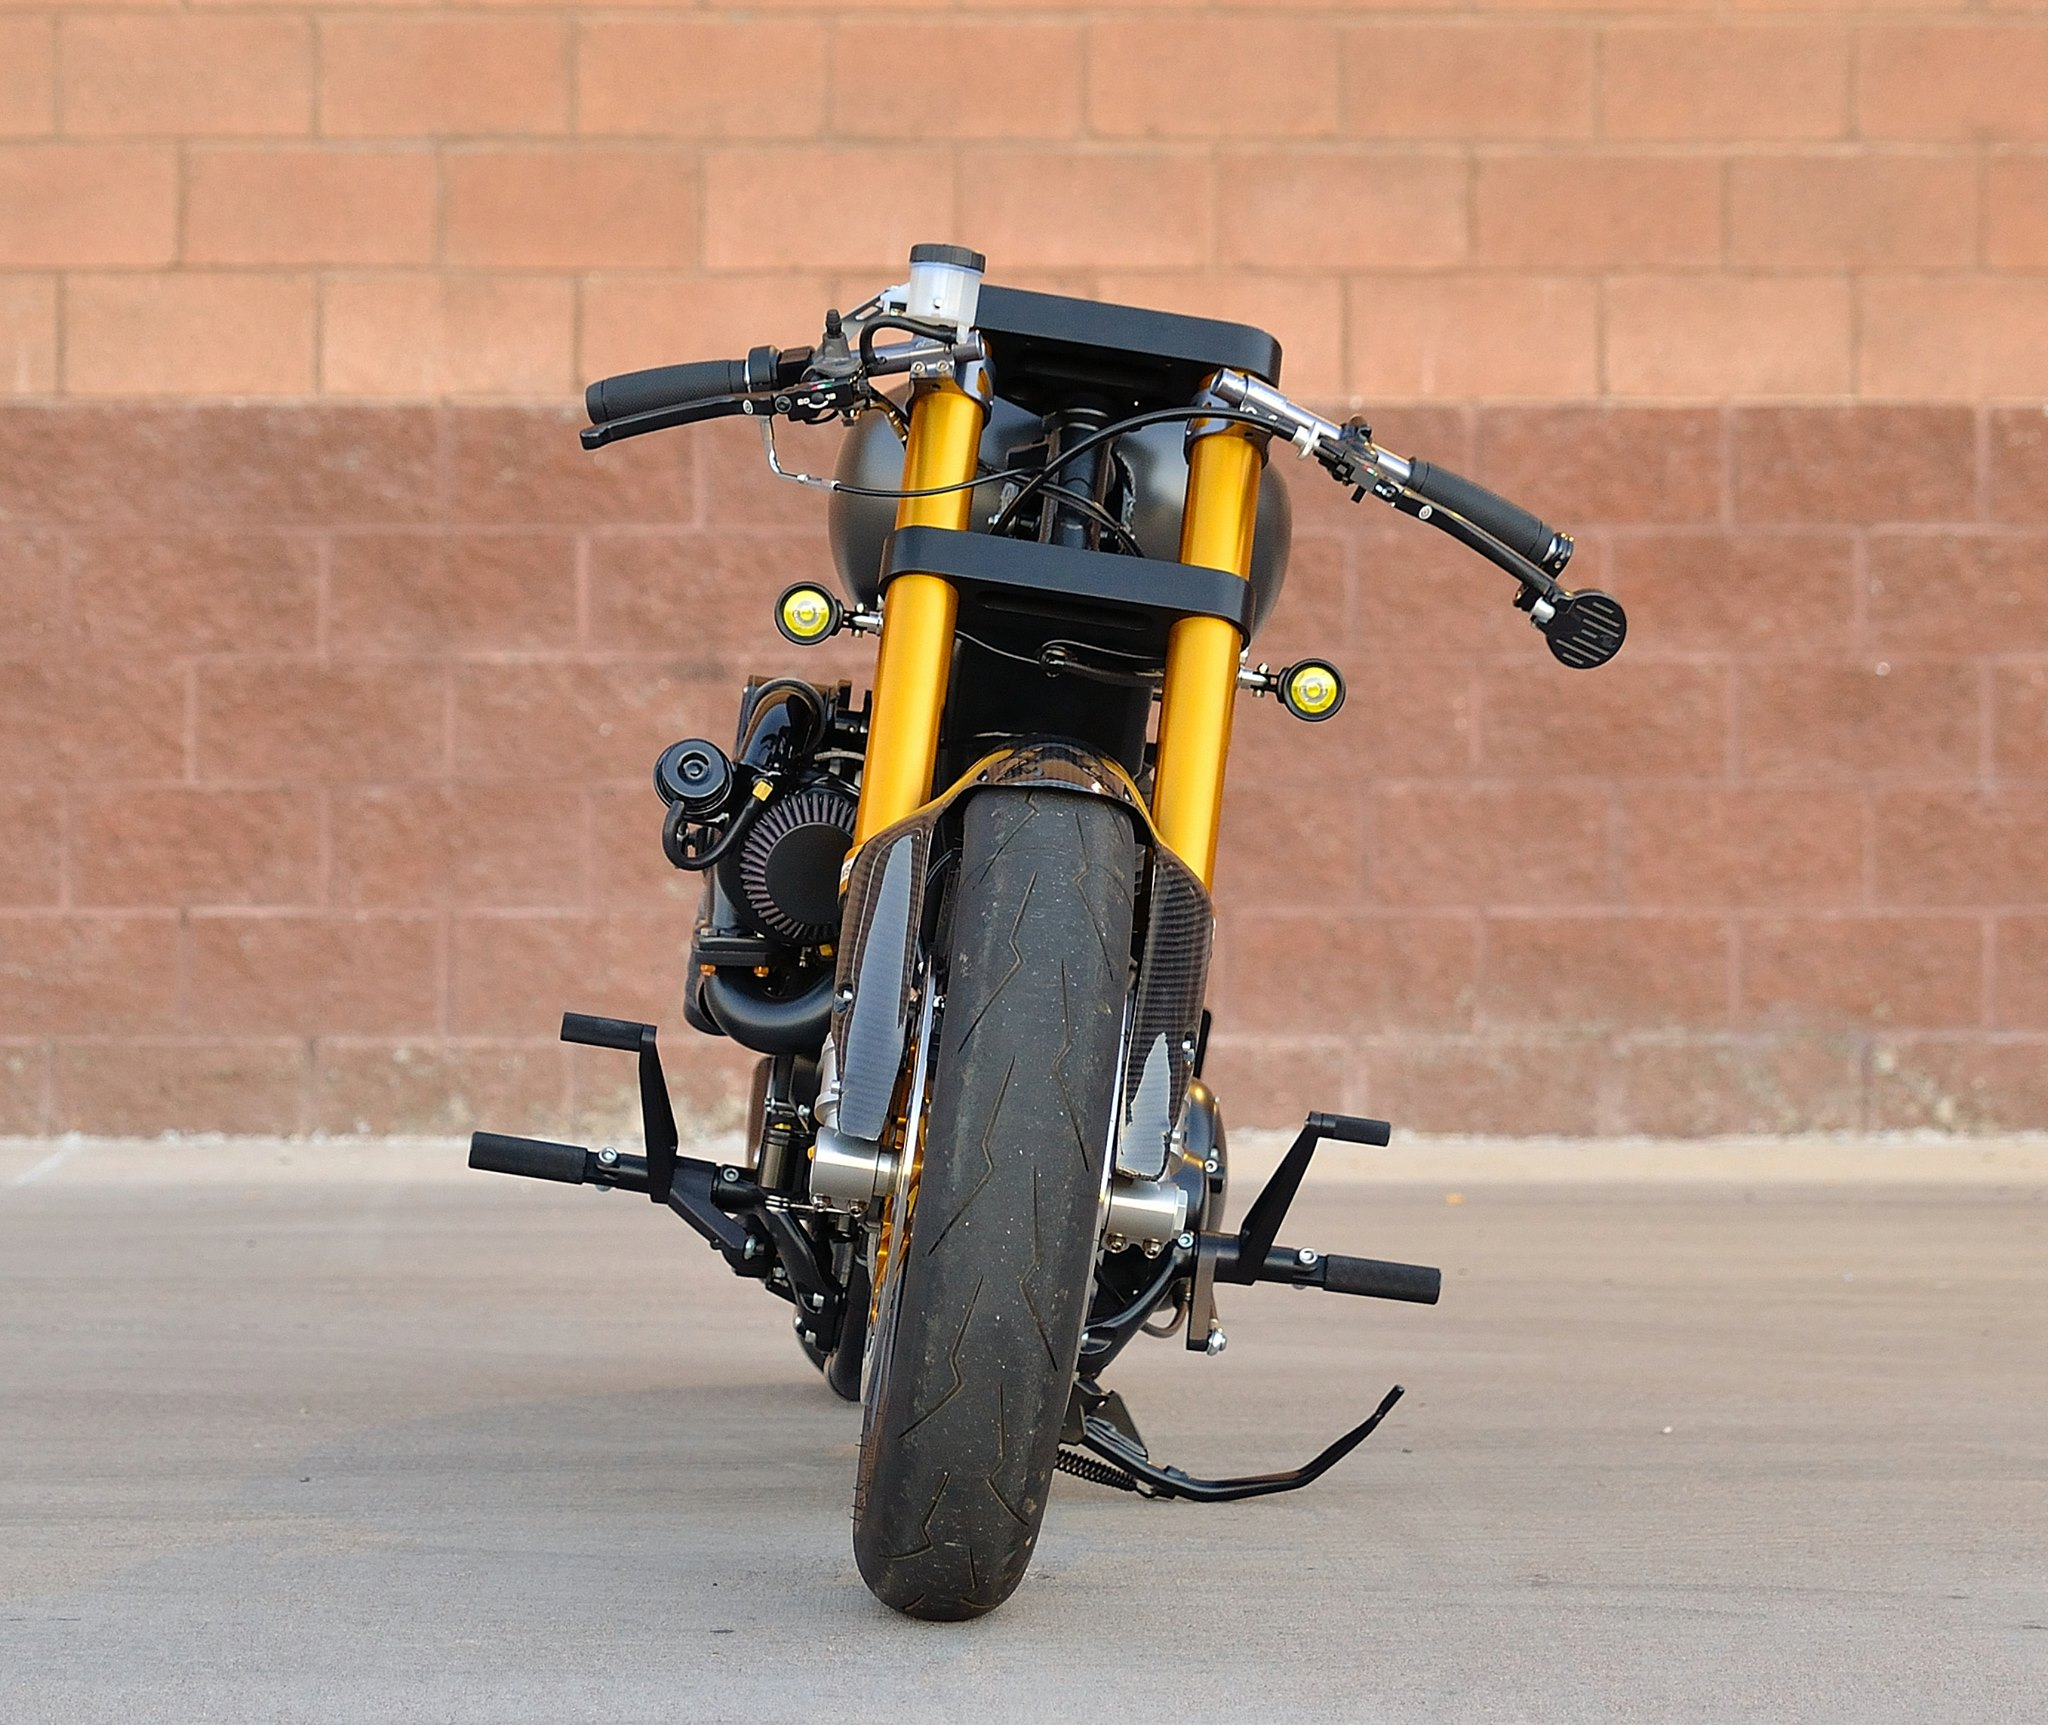 Turbo My Harley: DP Customs Turbo Destroyer Harley Sportster